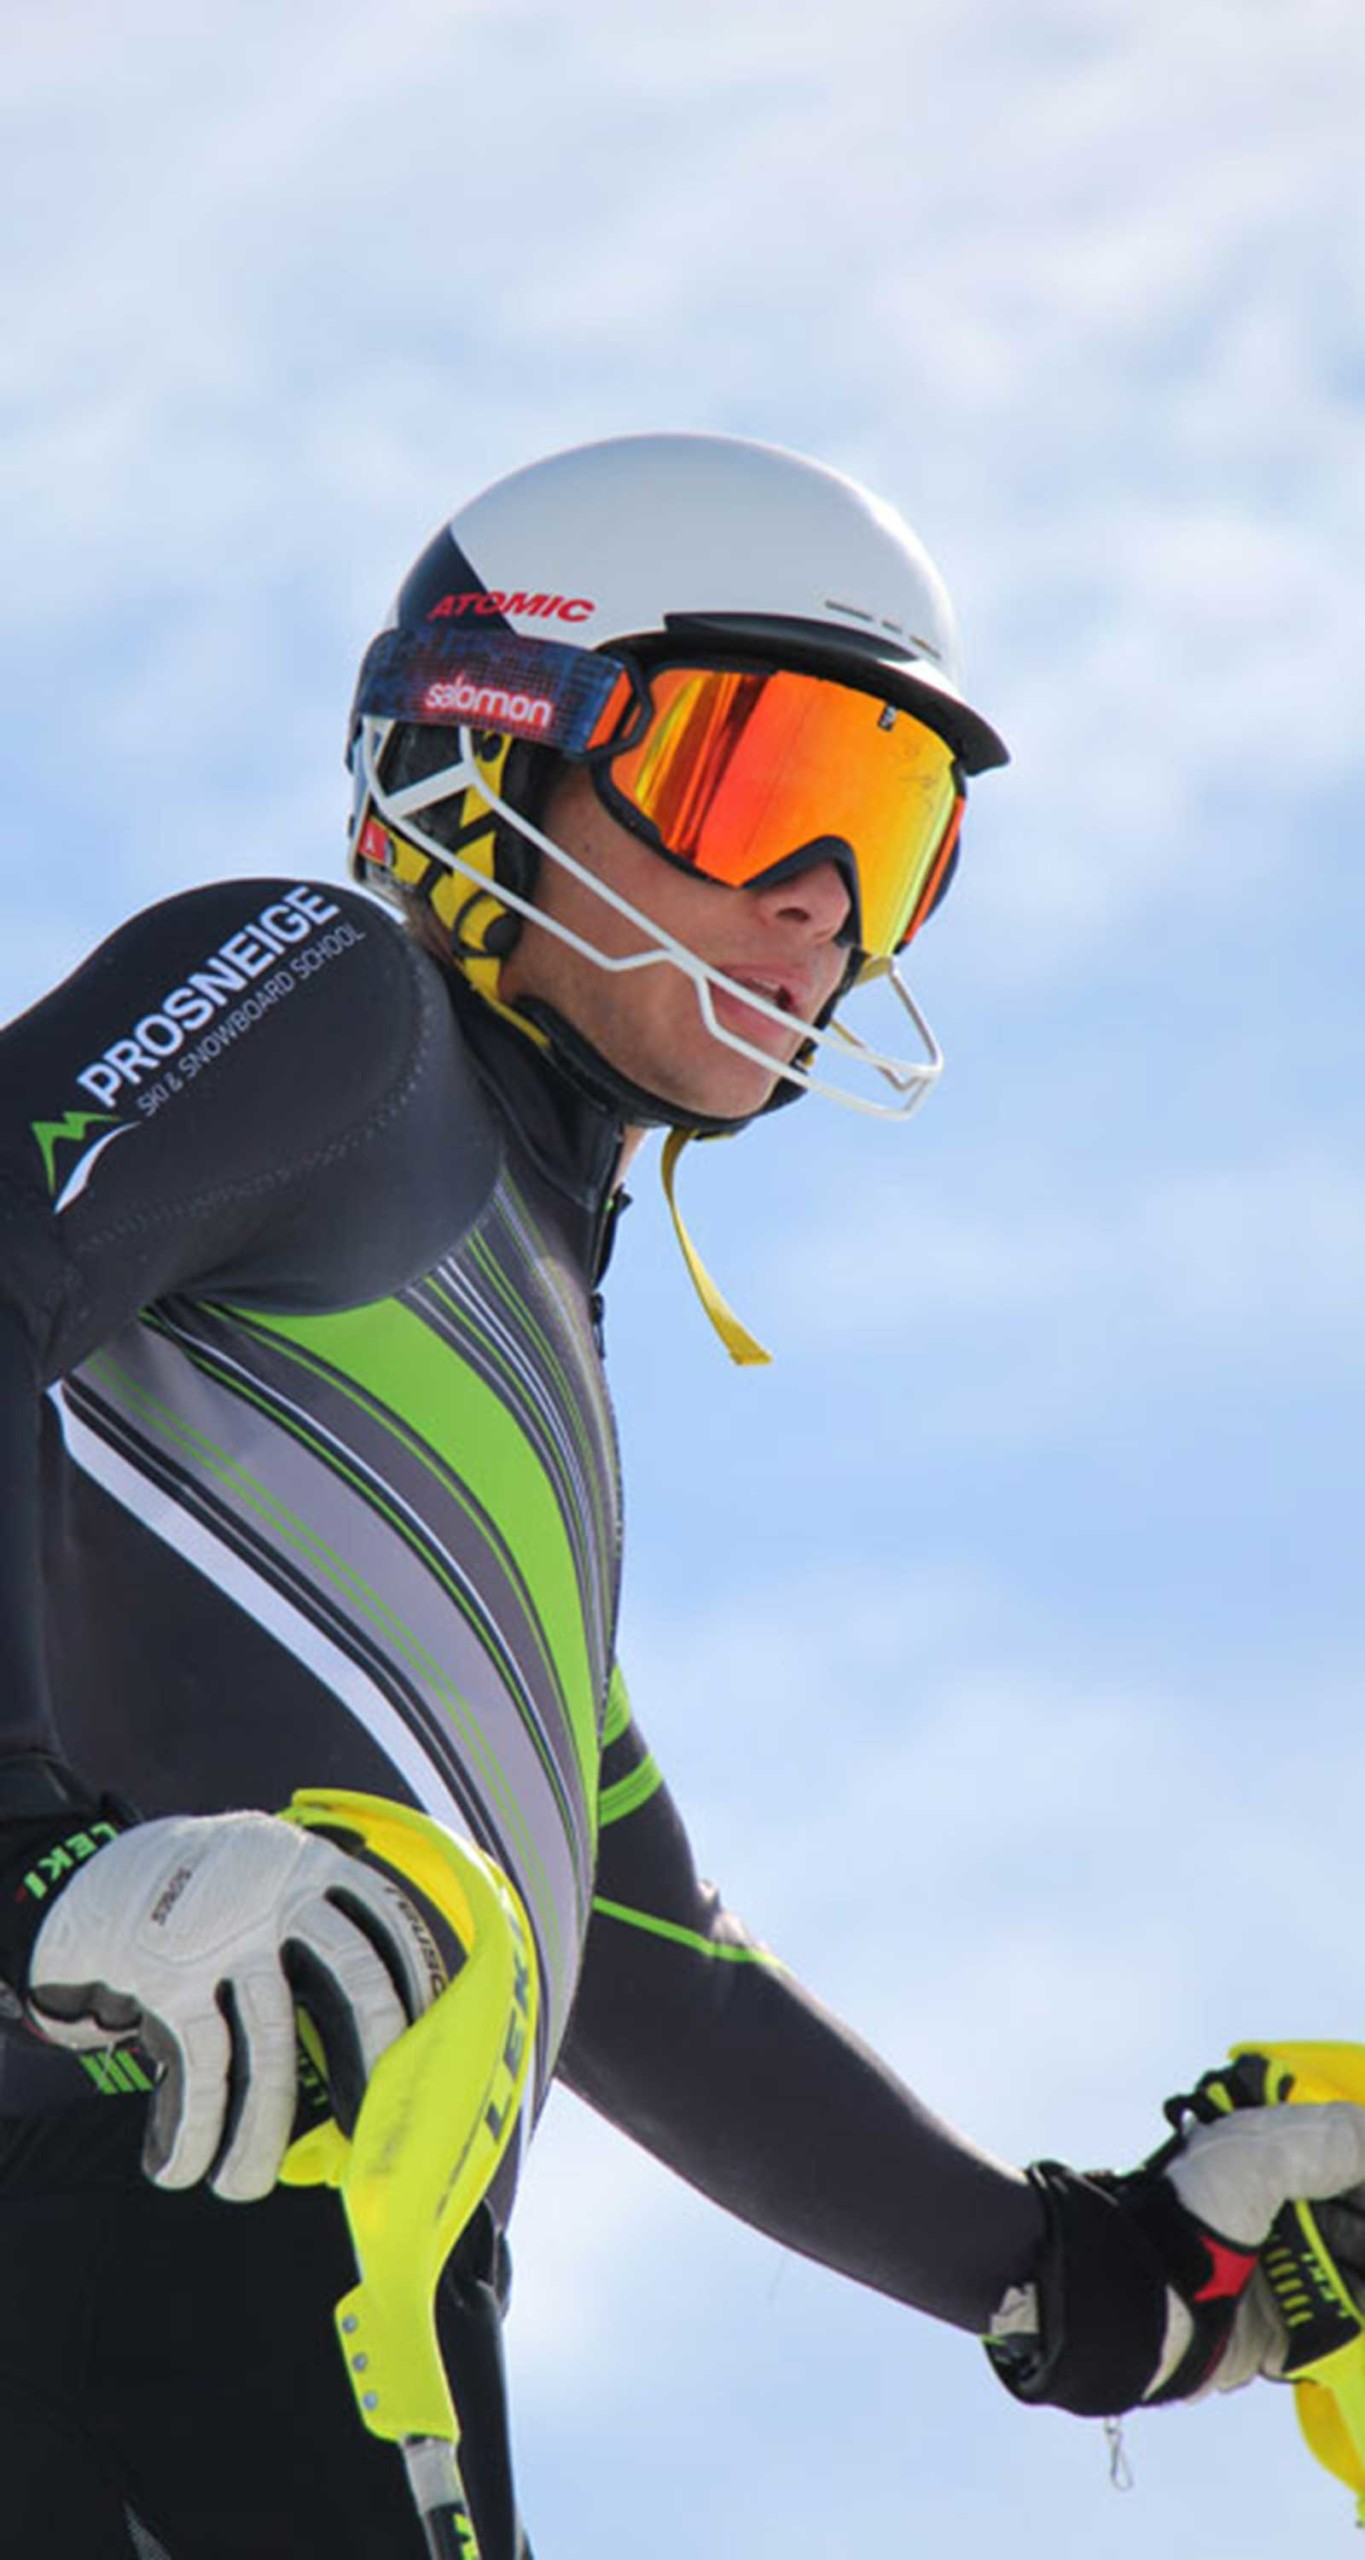 Devenir moniteur de ski